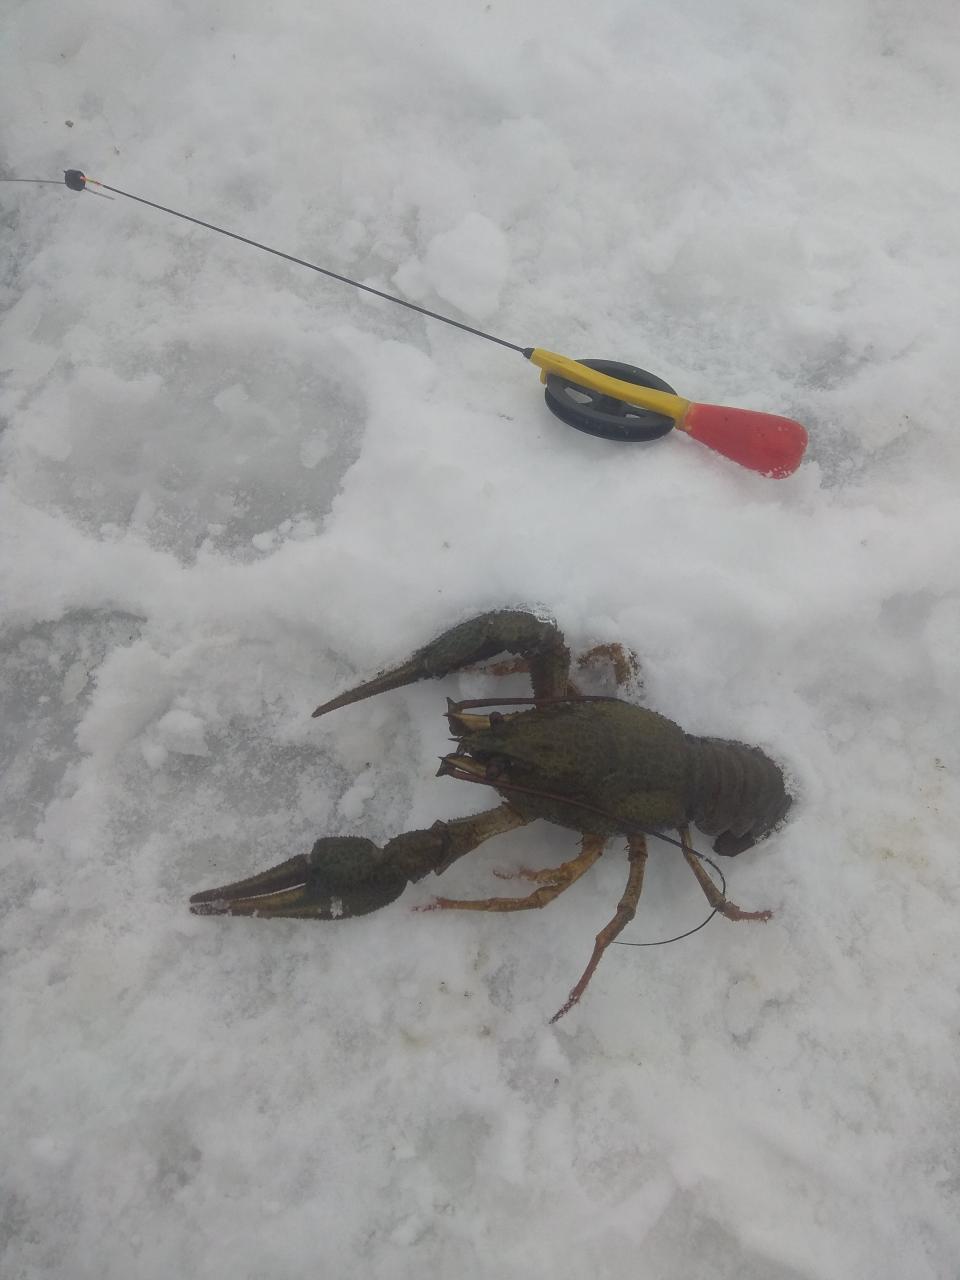 Были сегодня за МКАД.Сидели на русле.Я с утра ... | Отчеты о рыбалке в Беларуси